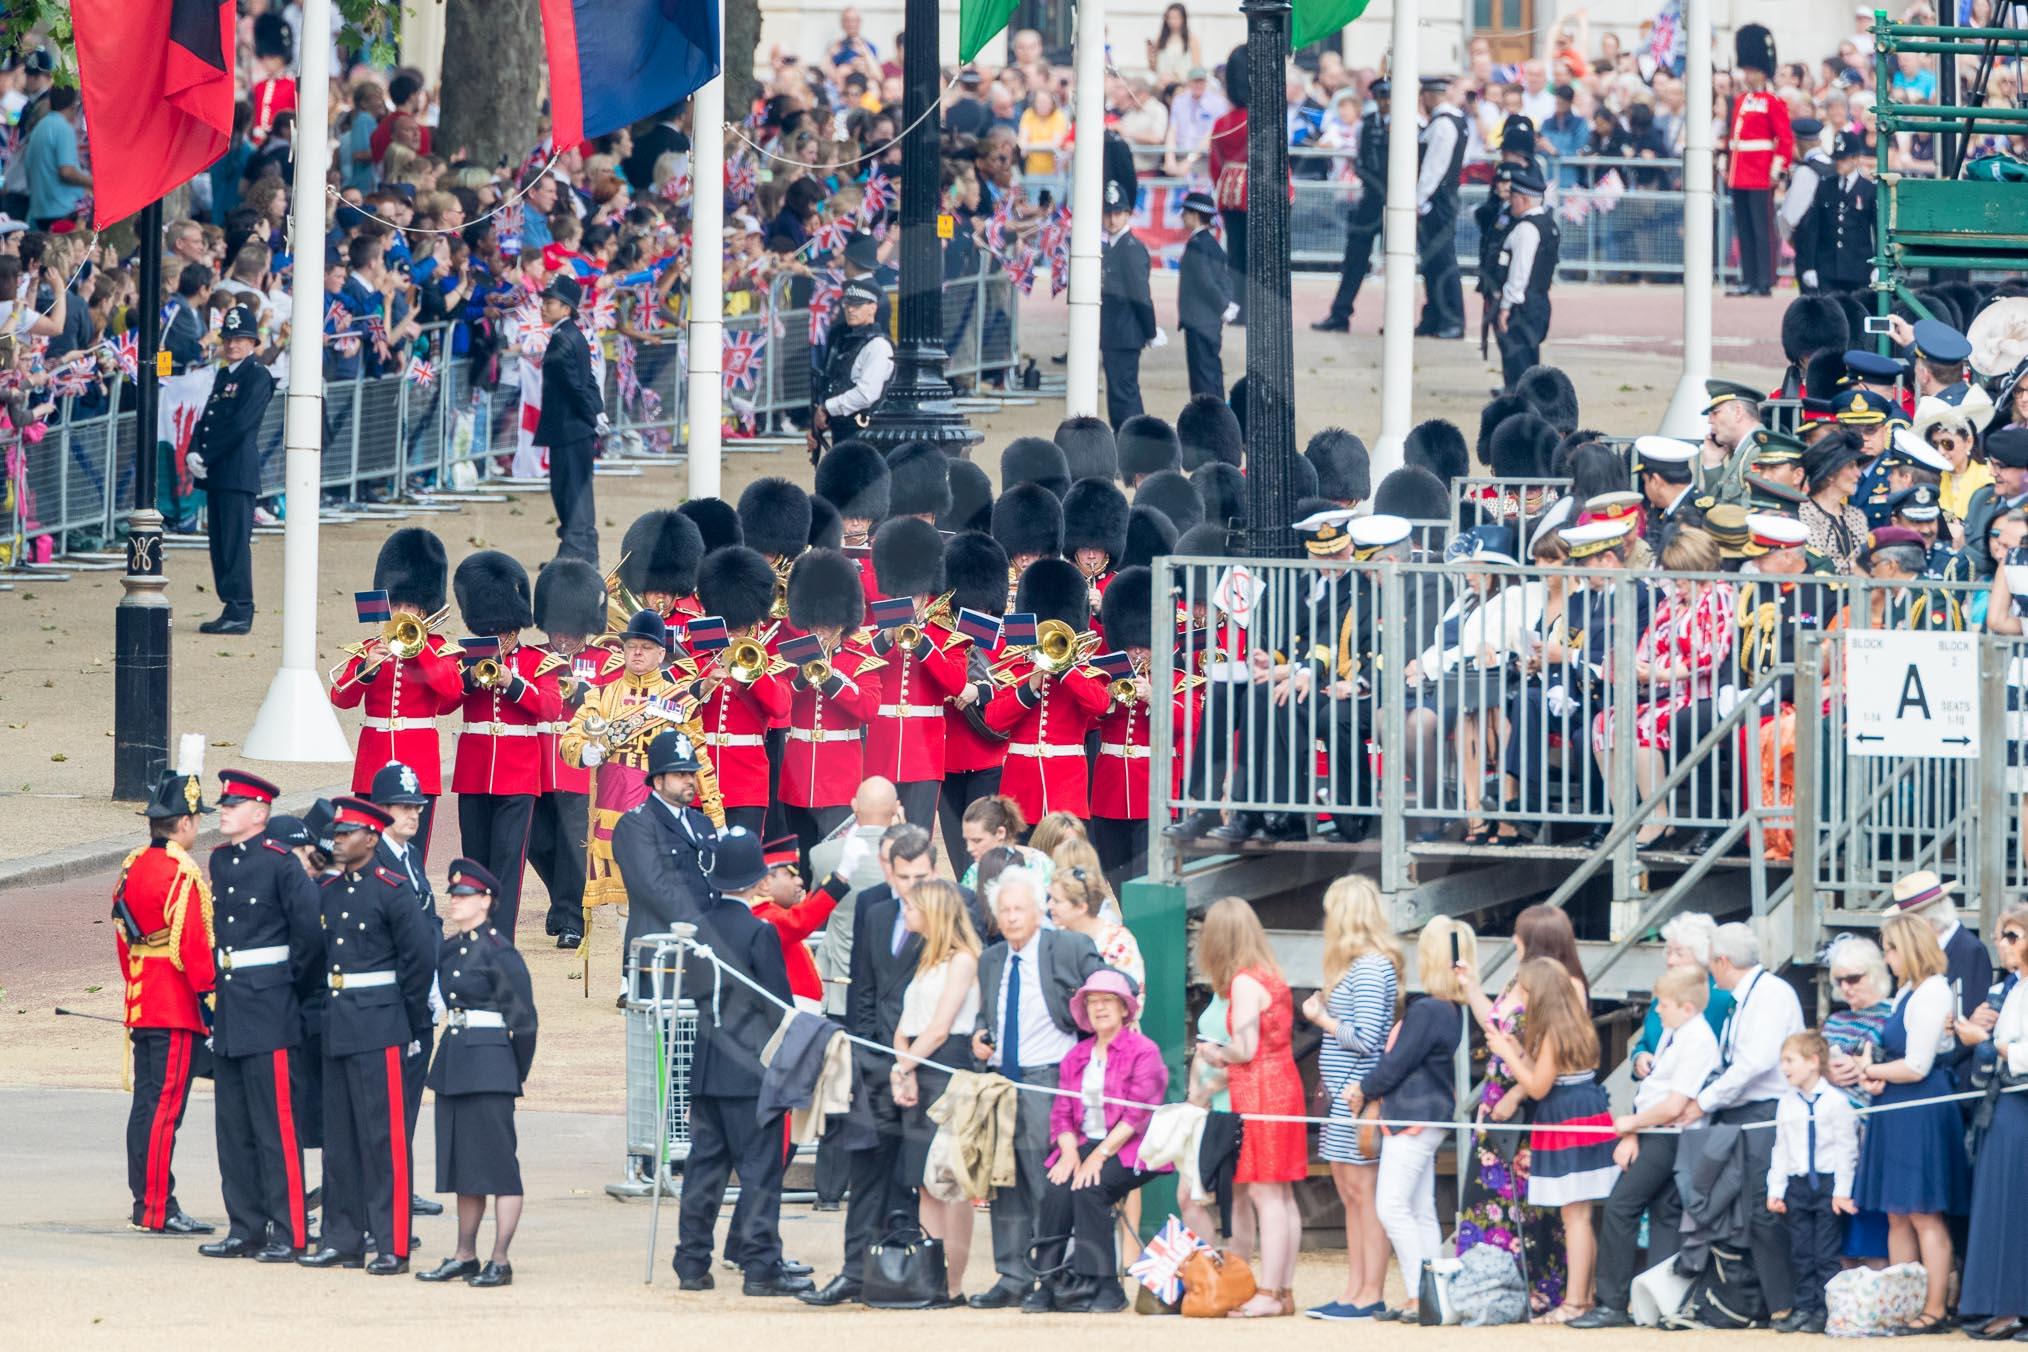 Queen's Birthday Parade 2016 - Trooping the Colour Photos ...